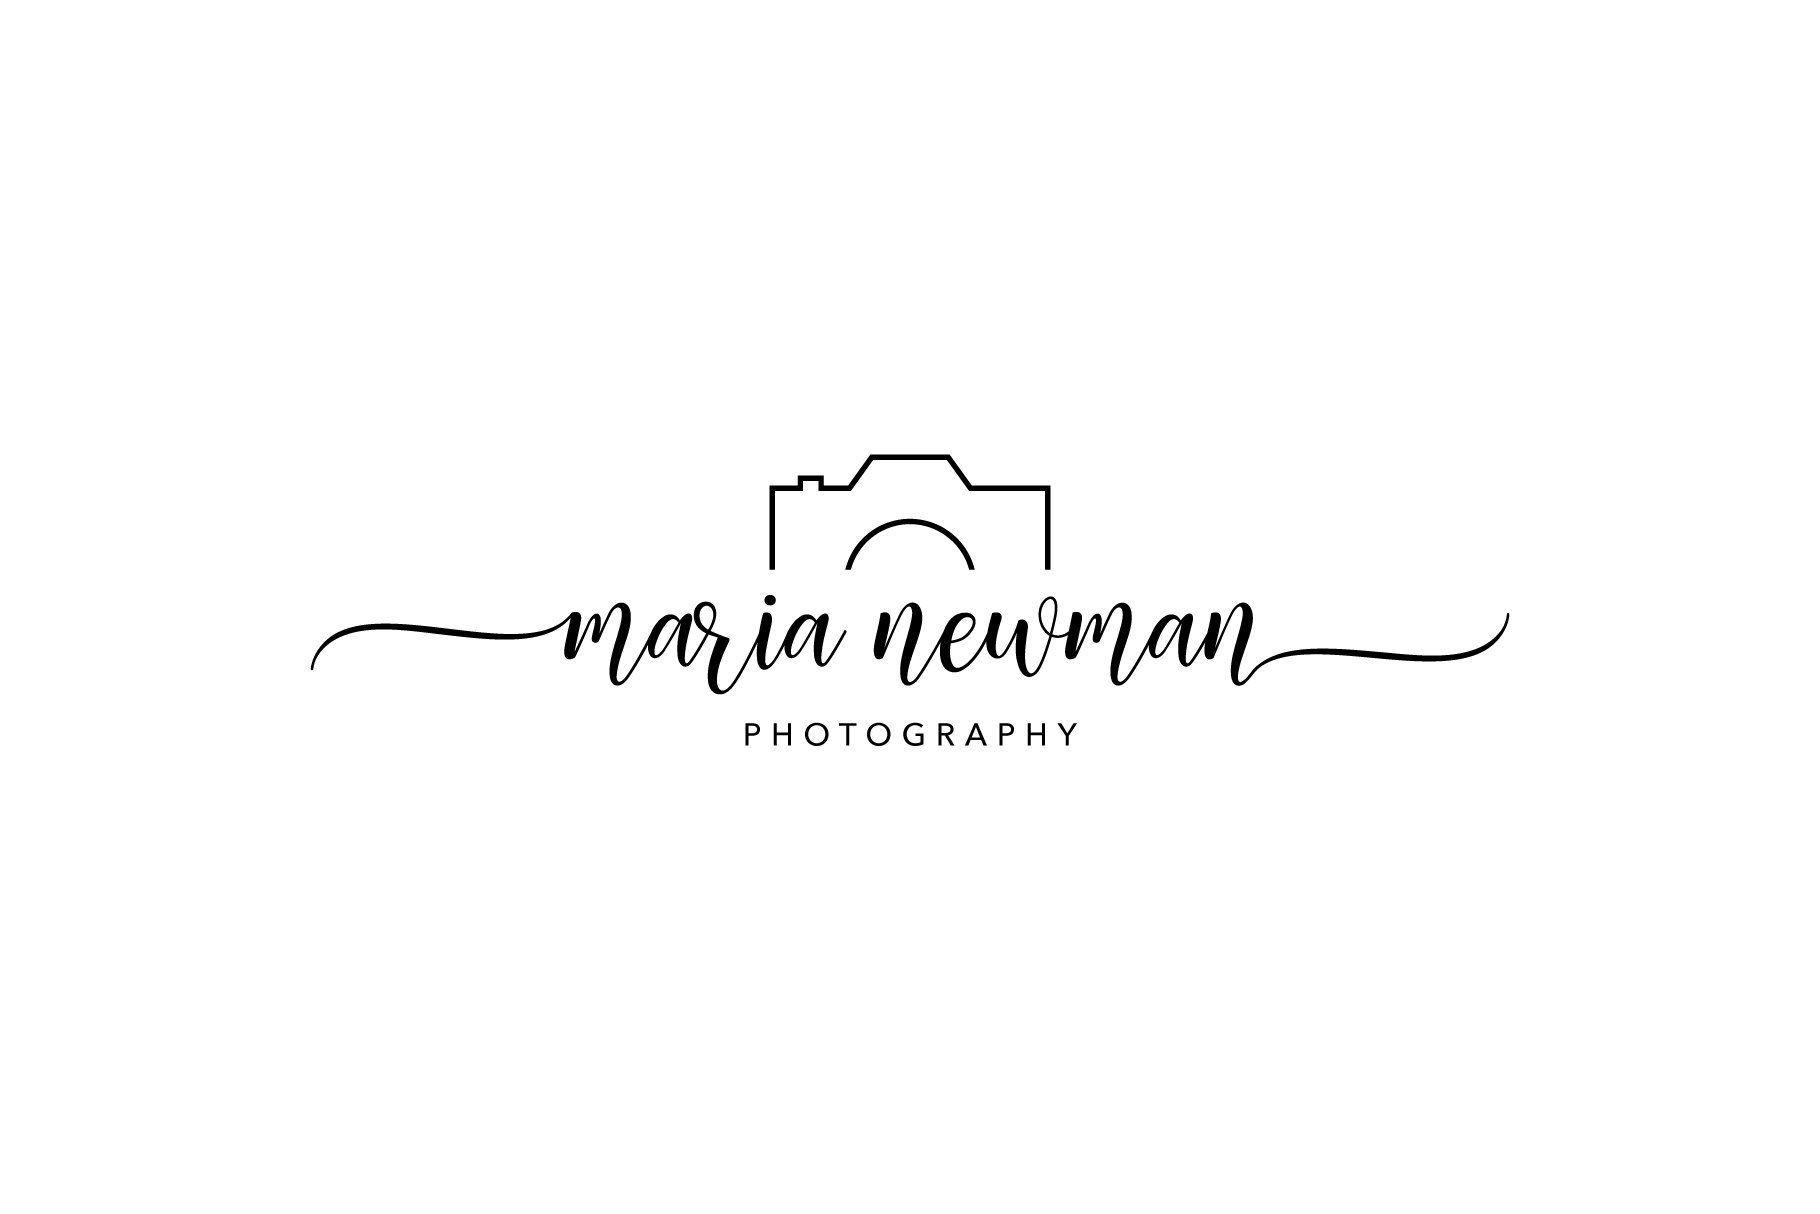 Photography Logo Design In 2020 Wedding Photography Logo Camera Logos Design Camera Logo